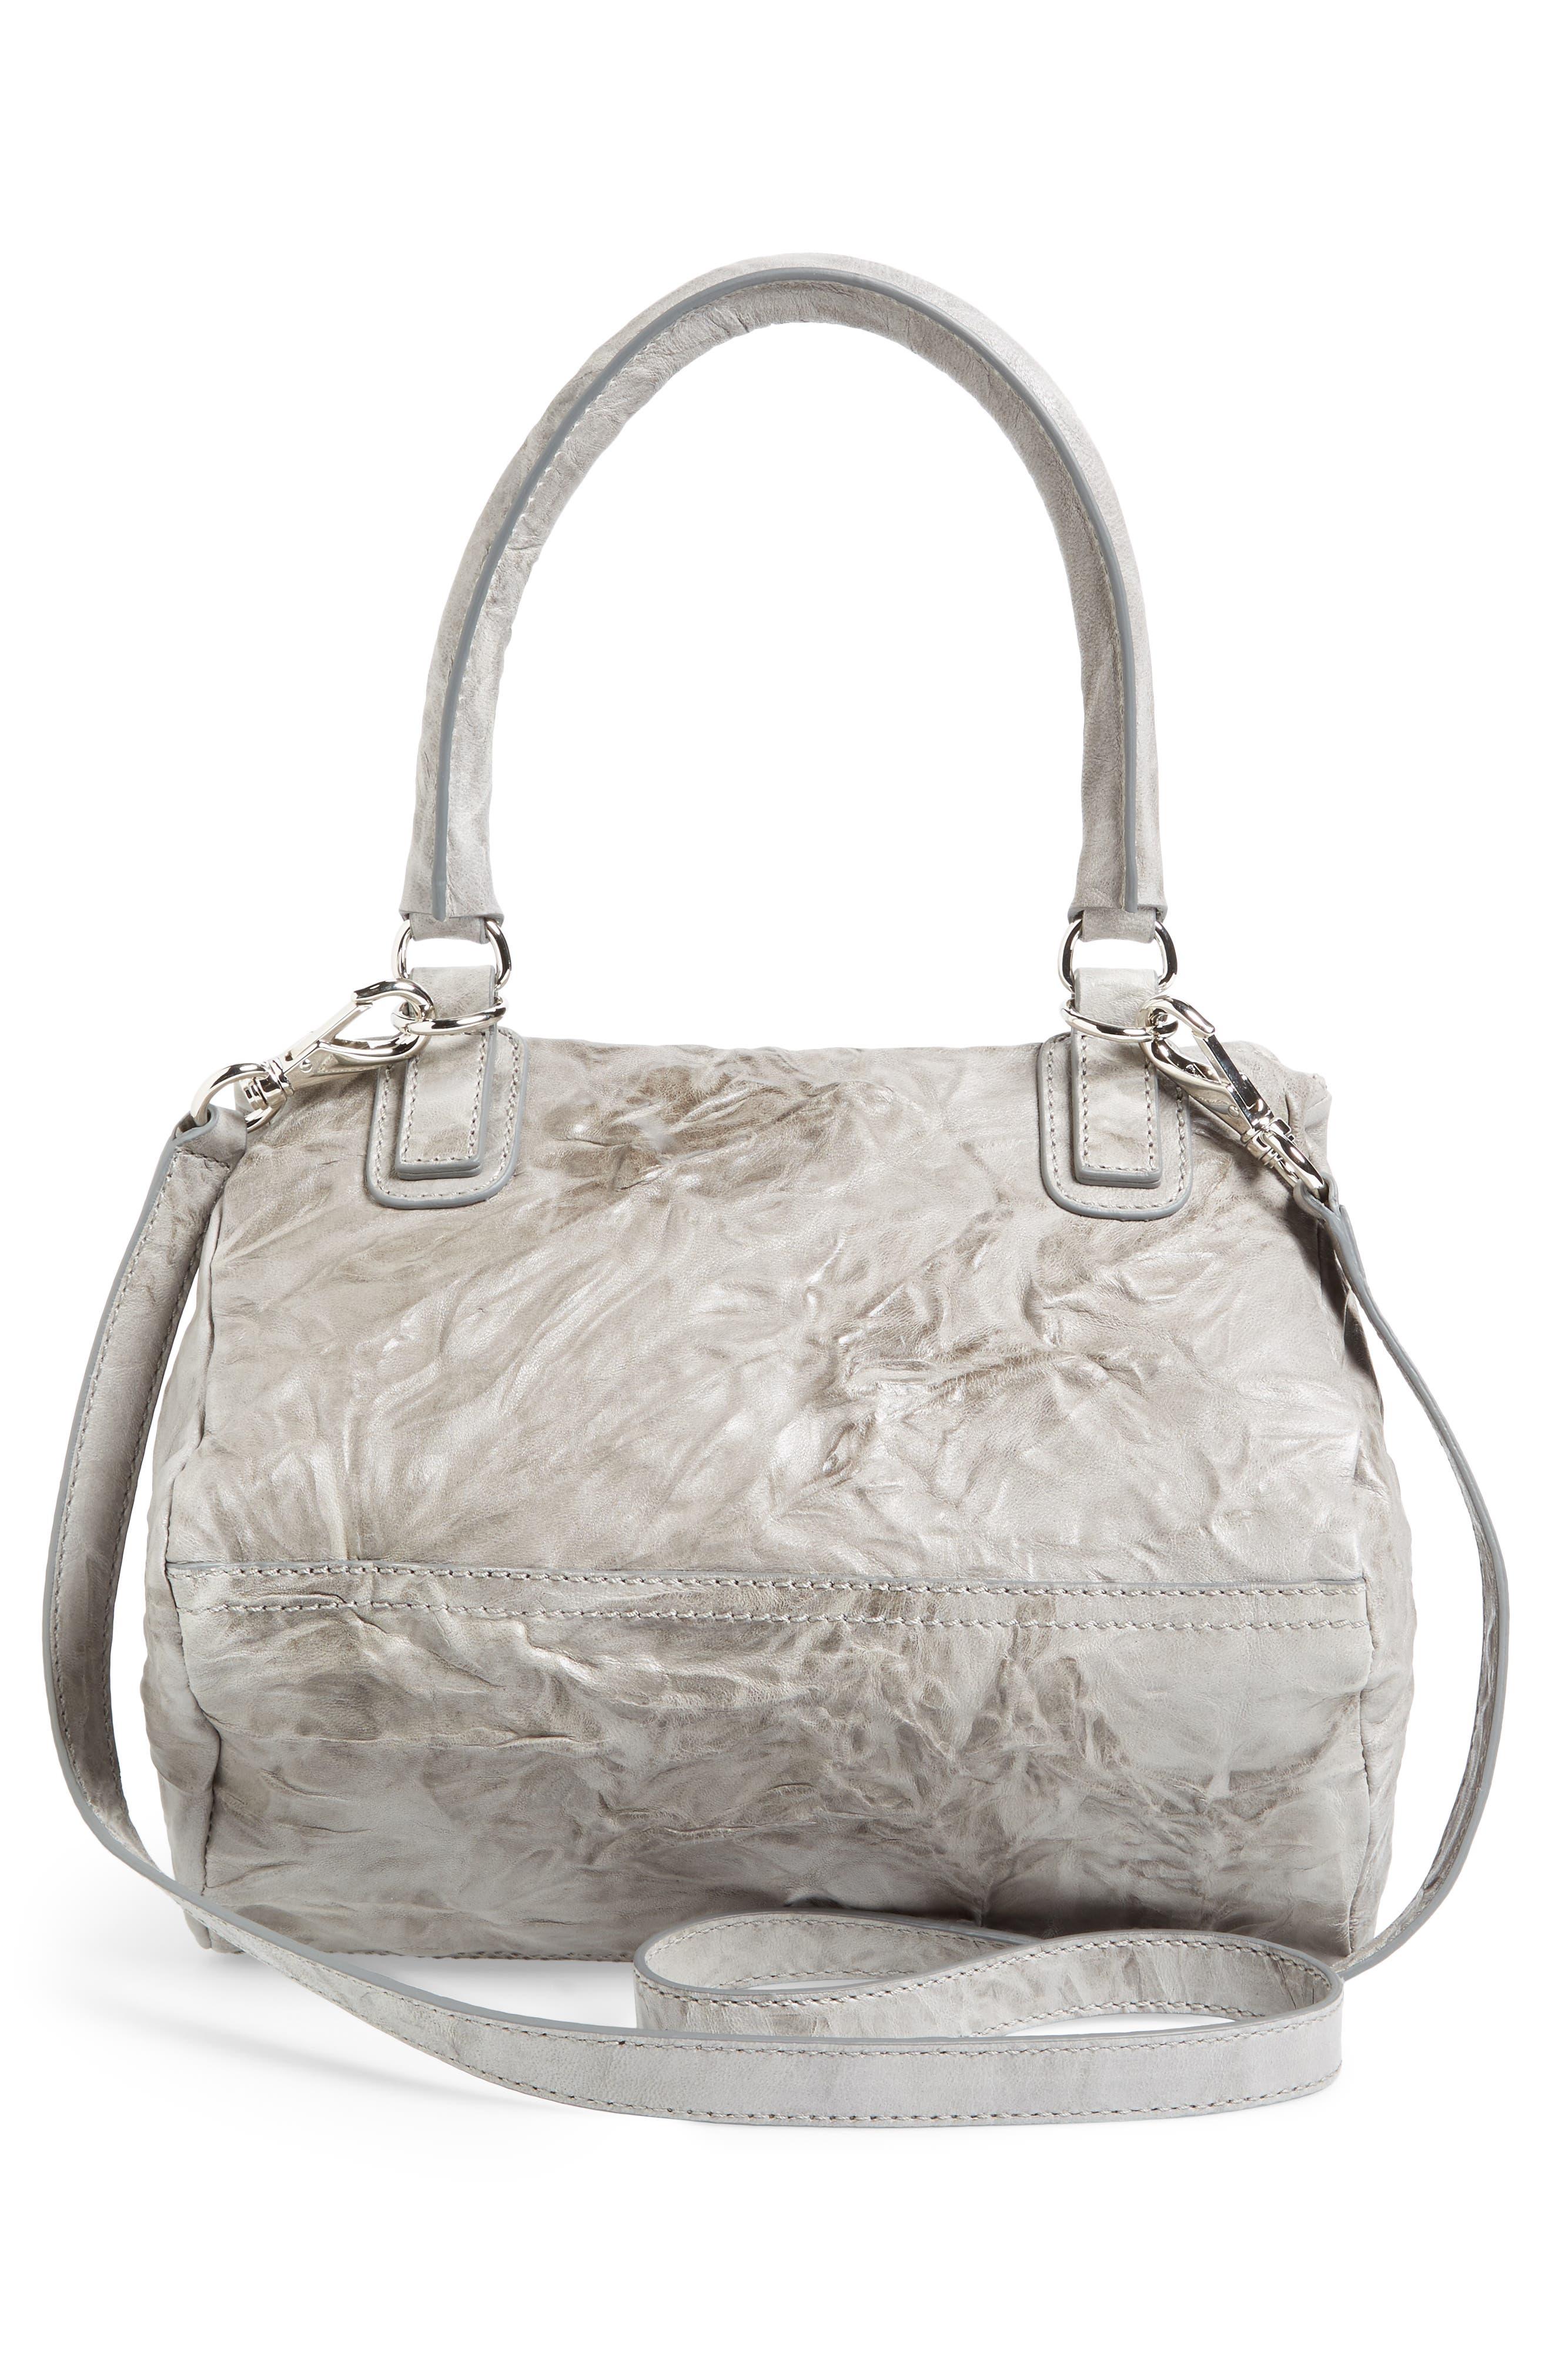 Alternate Image 3  - Givenchy 'Small Pepe Pandora' Leather Shoulder Bag